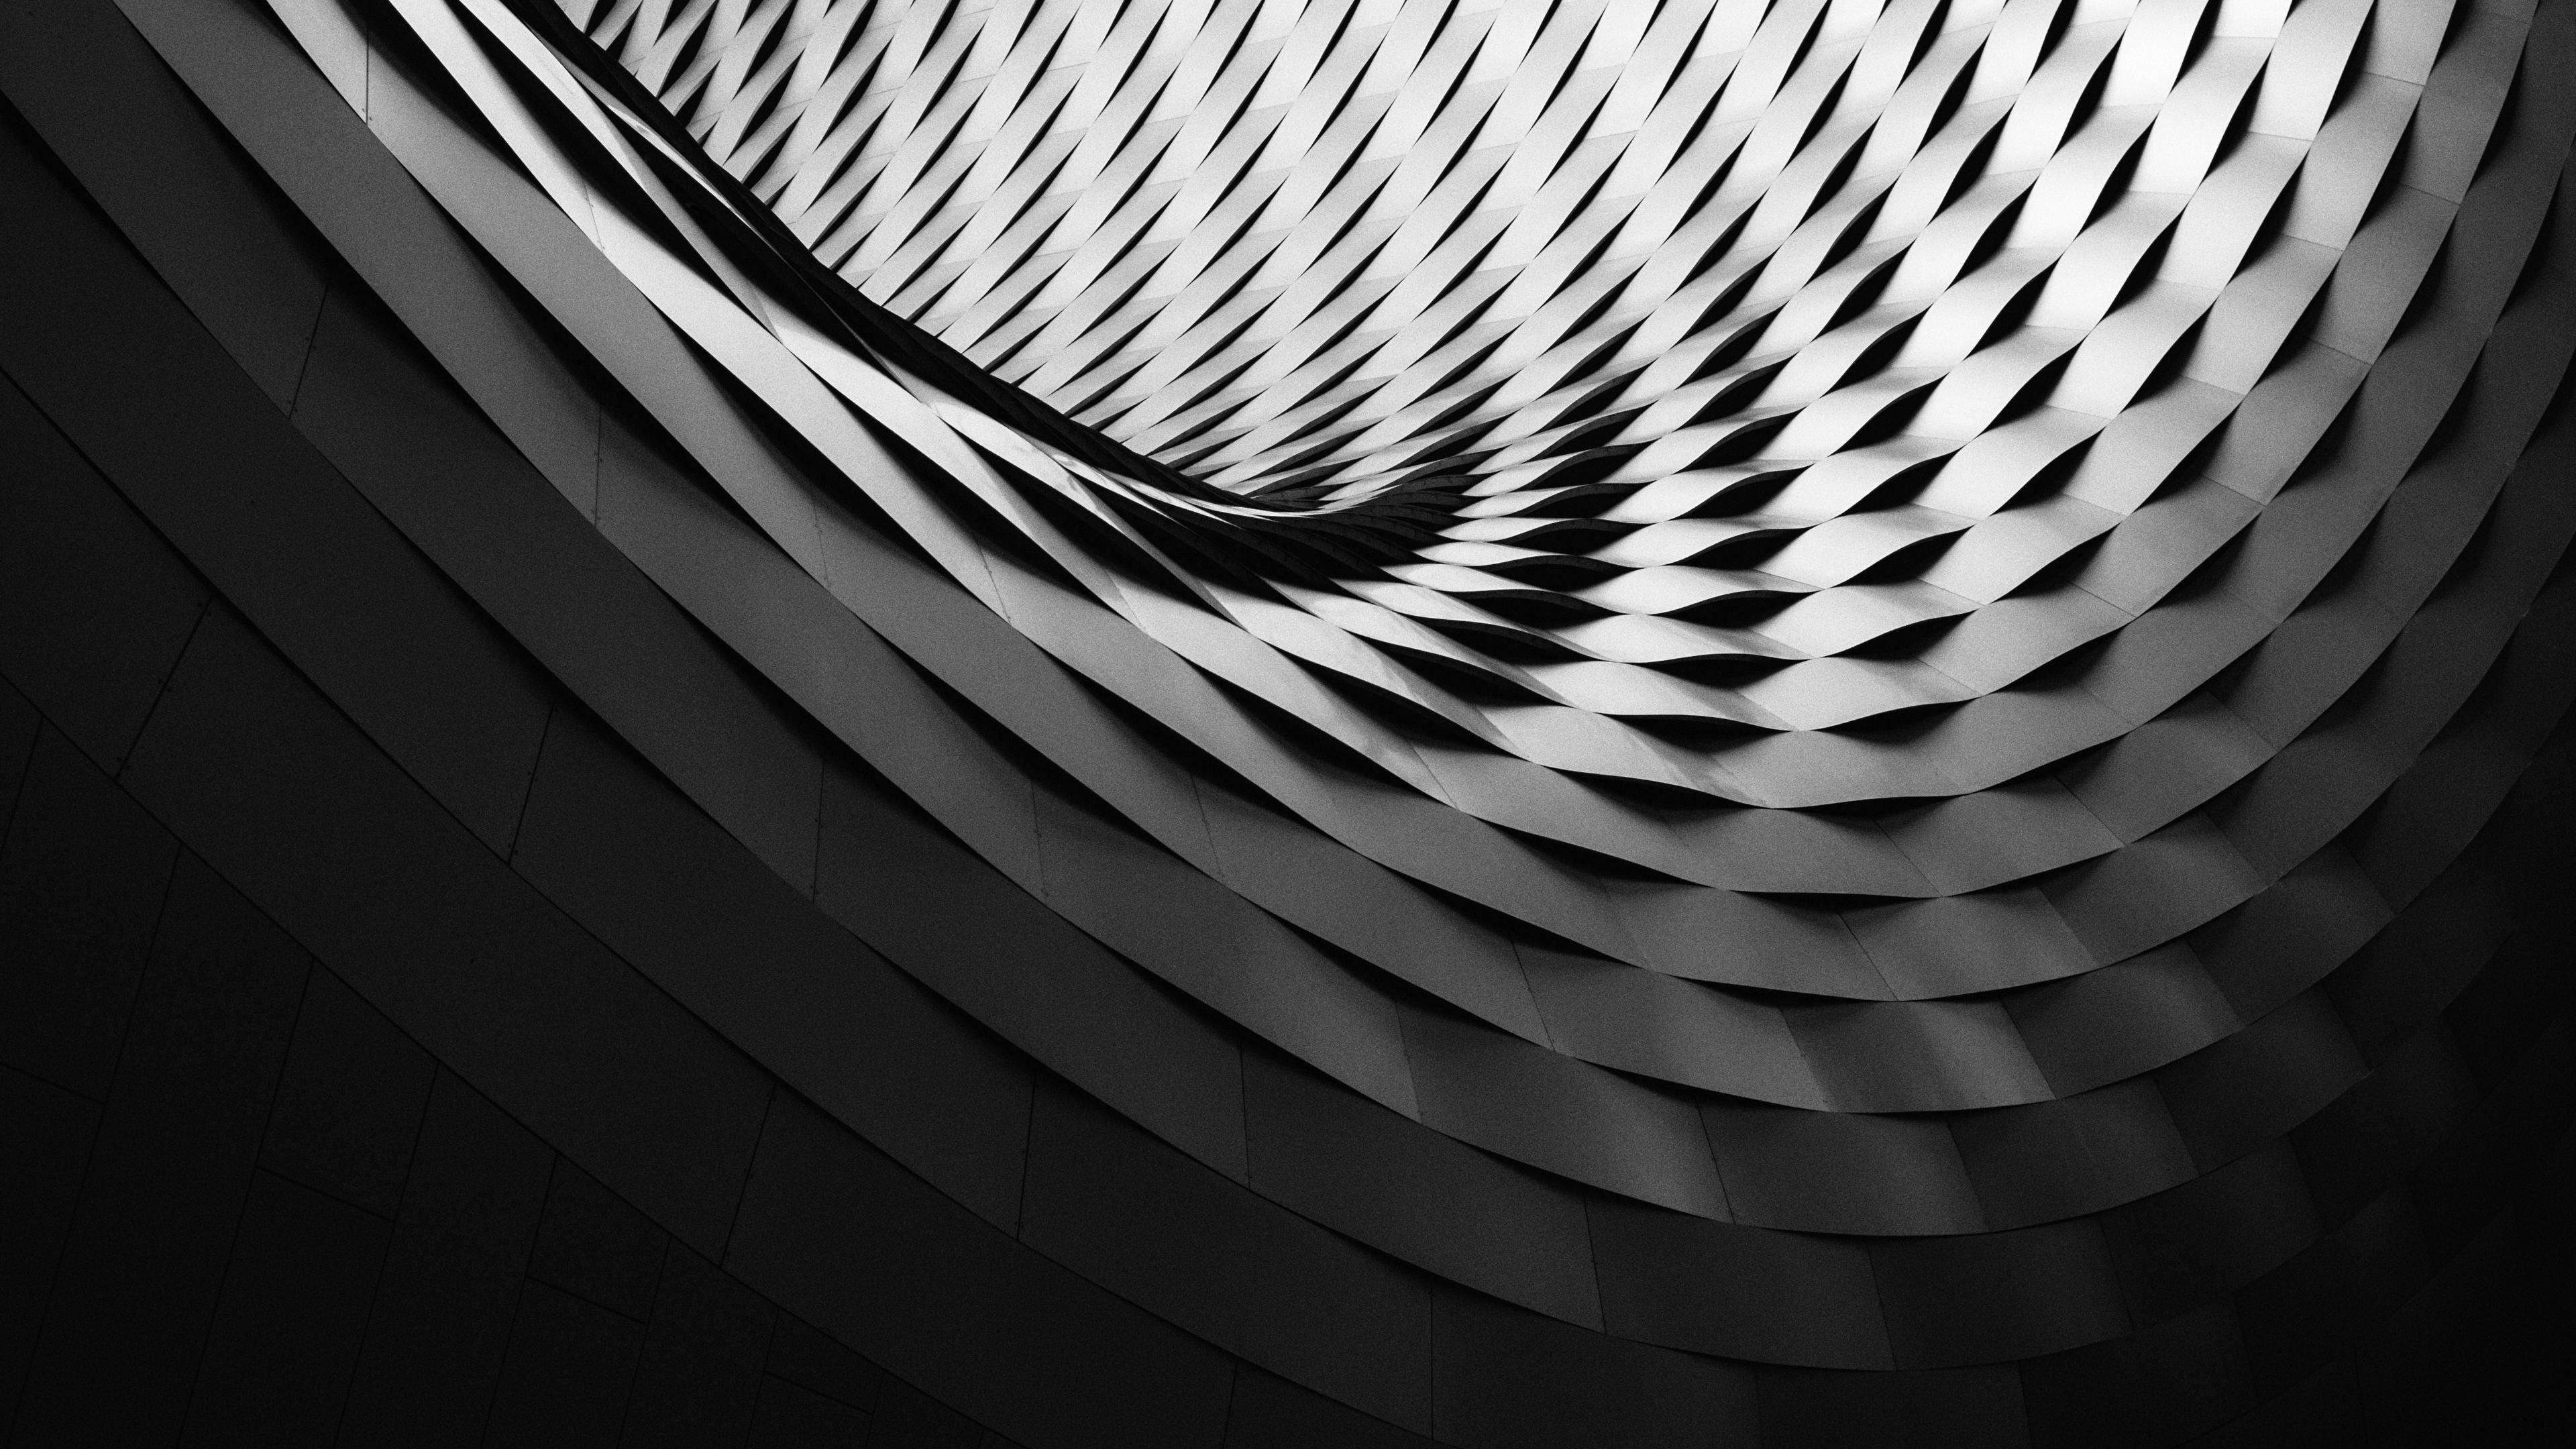 abstract spiral pattern 4k 1539371194 - Abstract Spiral Pattern 4k - spiral wallpapers, pattern wallpapers, hd-wallpapers, abstract wallpapers, 4k-wallpapers